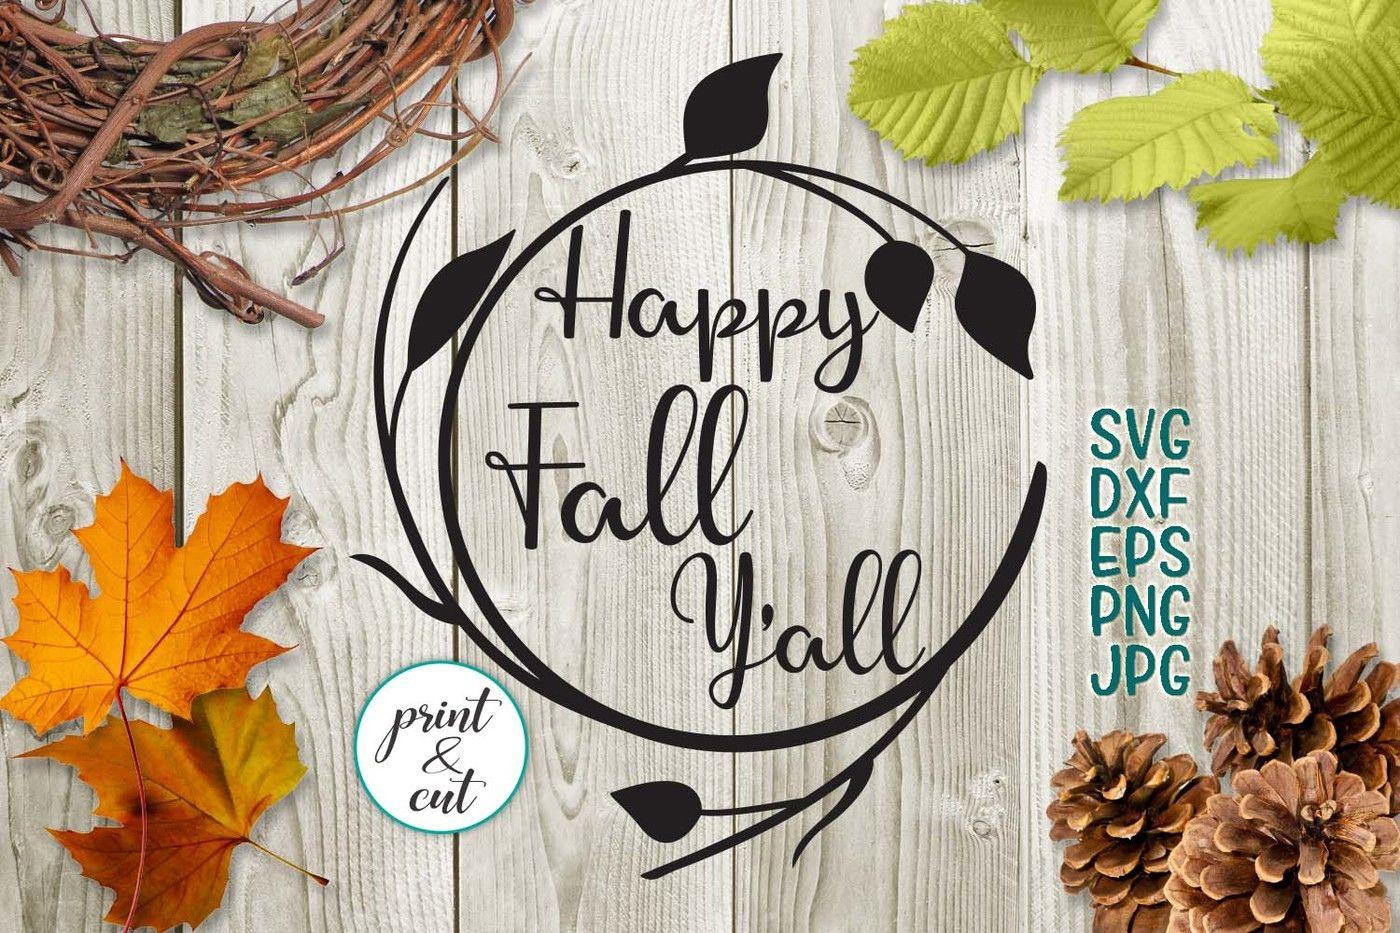 Download happy fall yall svg, happy fall y'all, svg cricut file ...